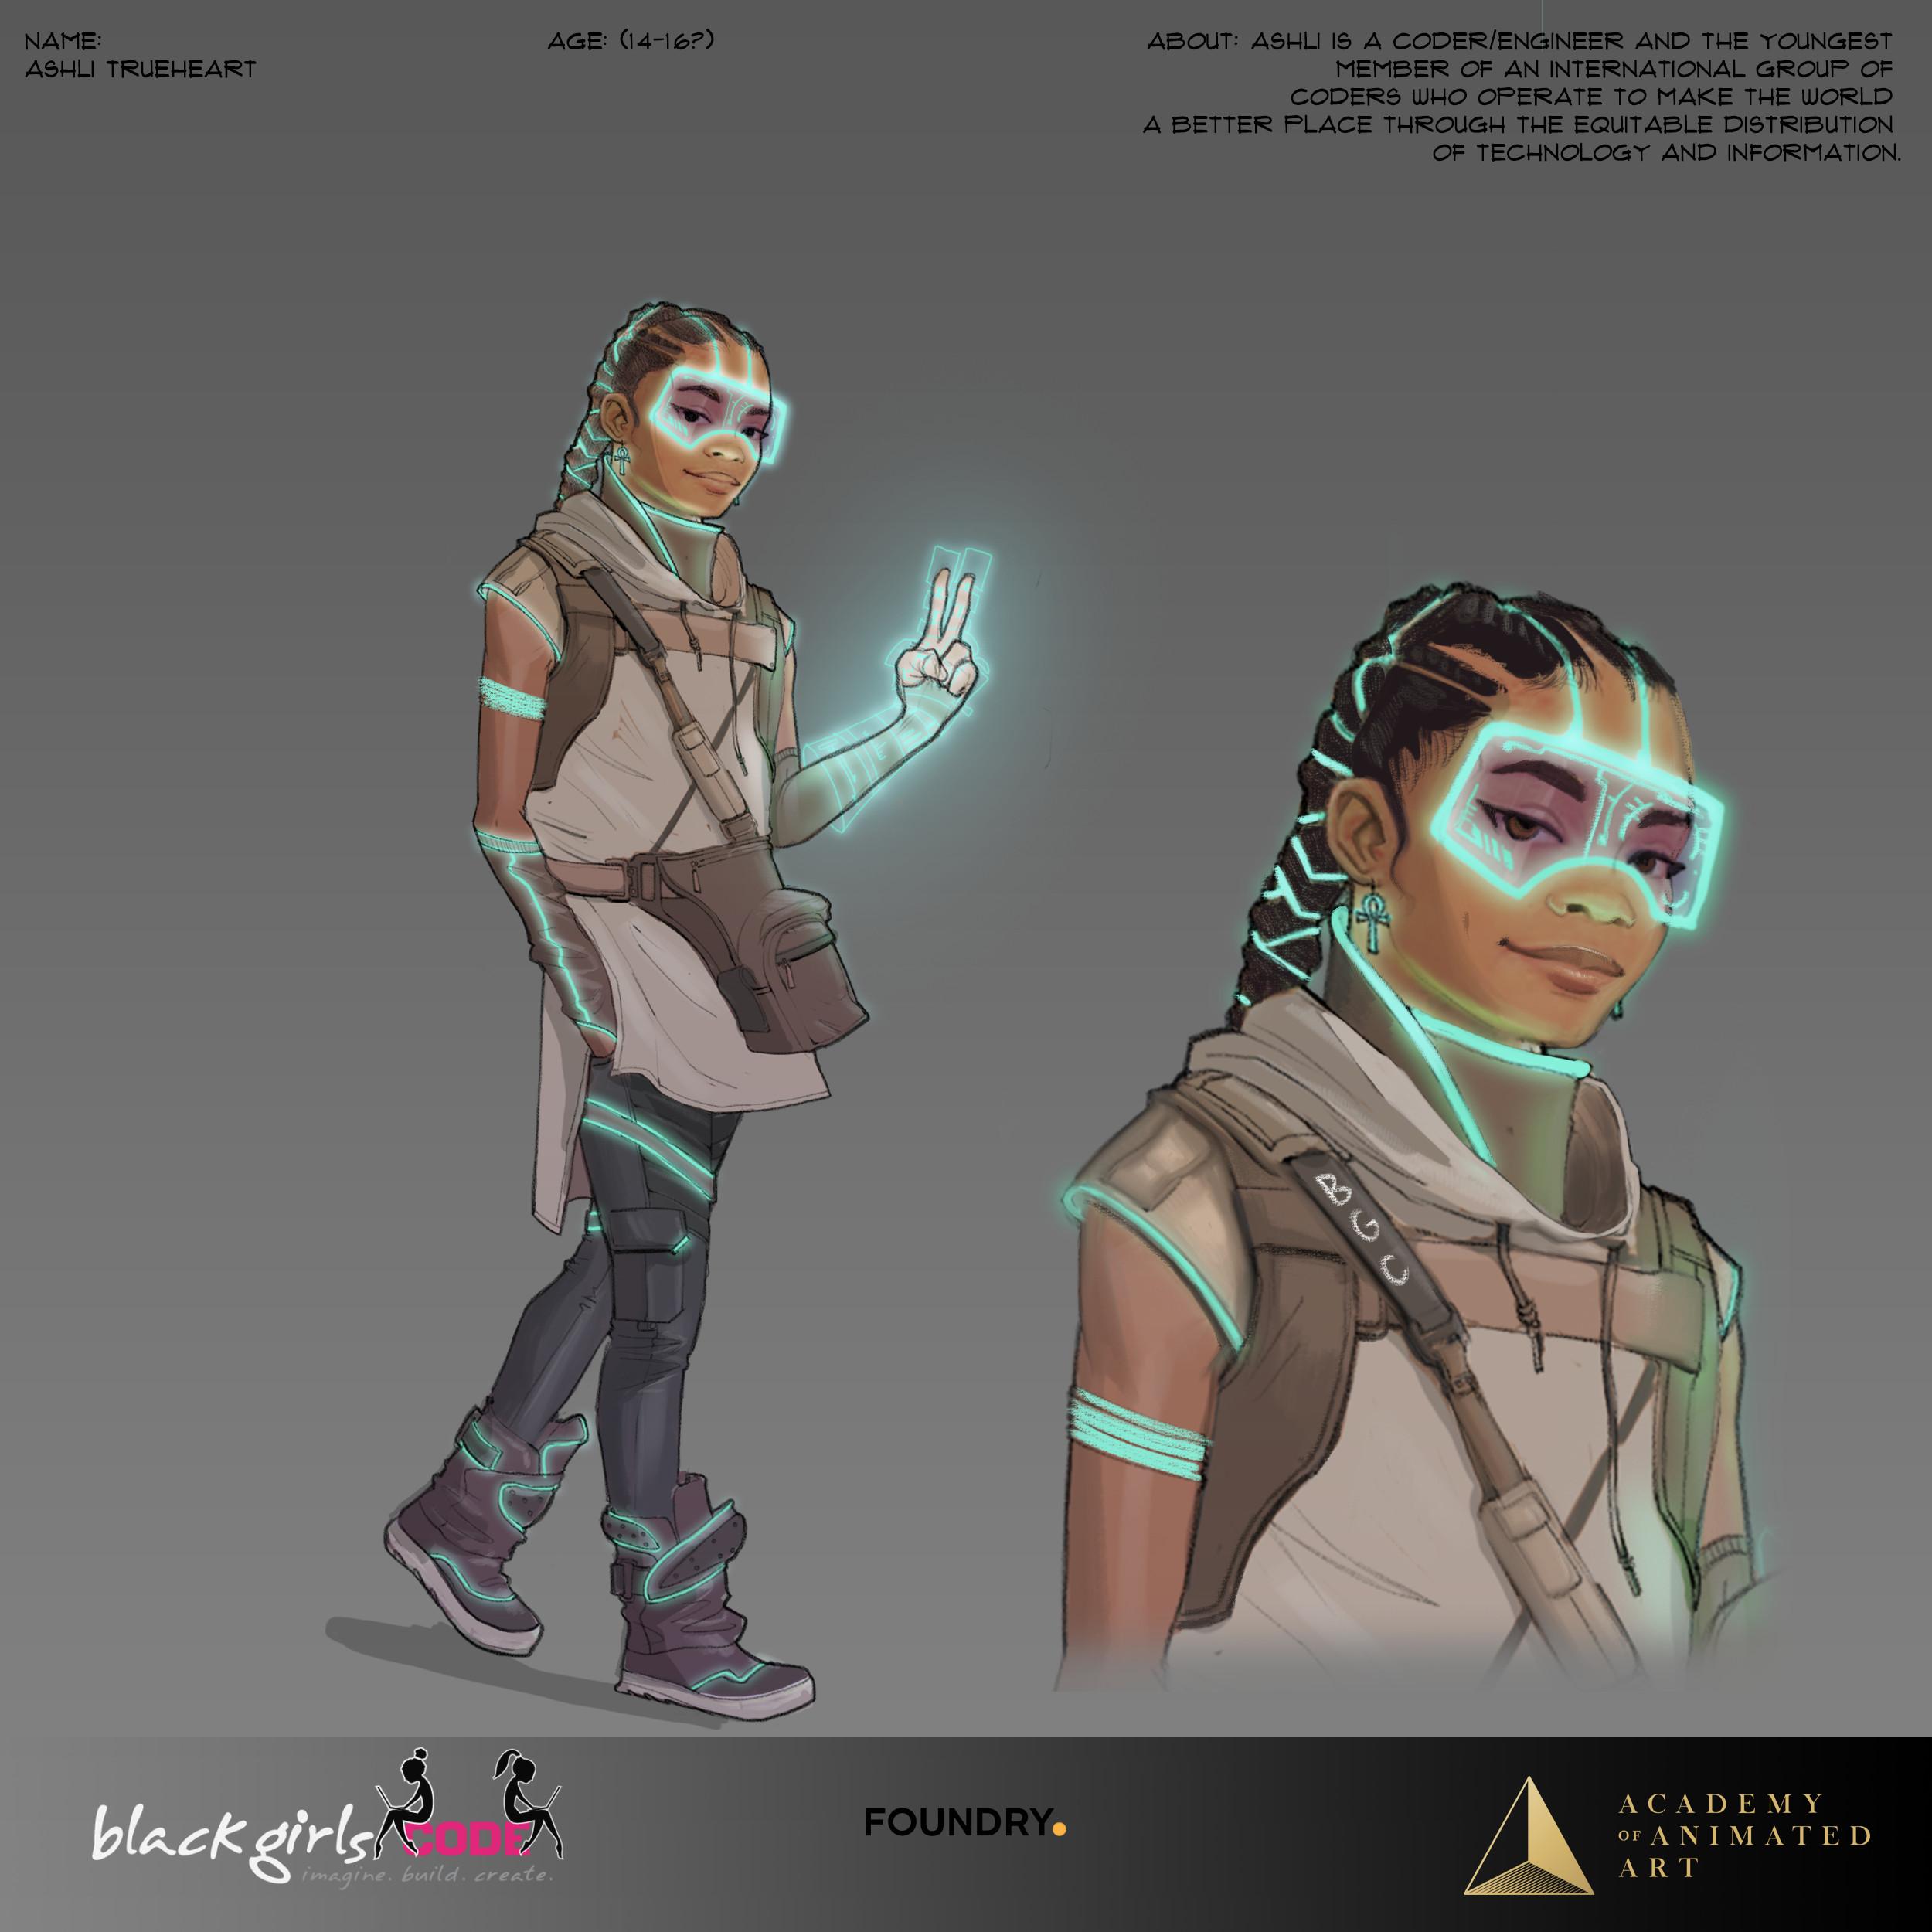 One of the original concept sketches